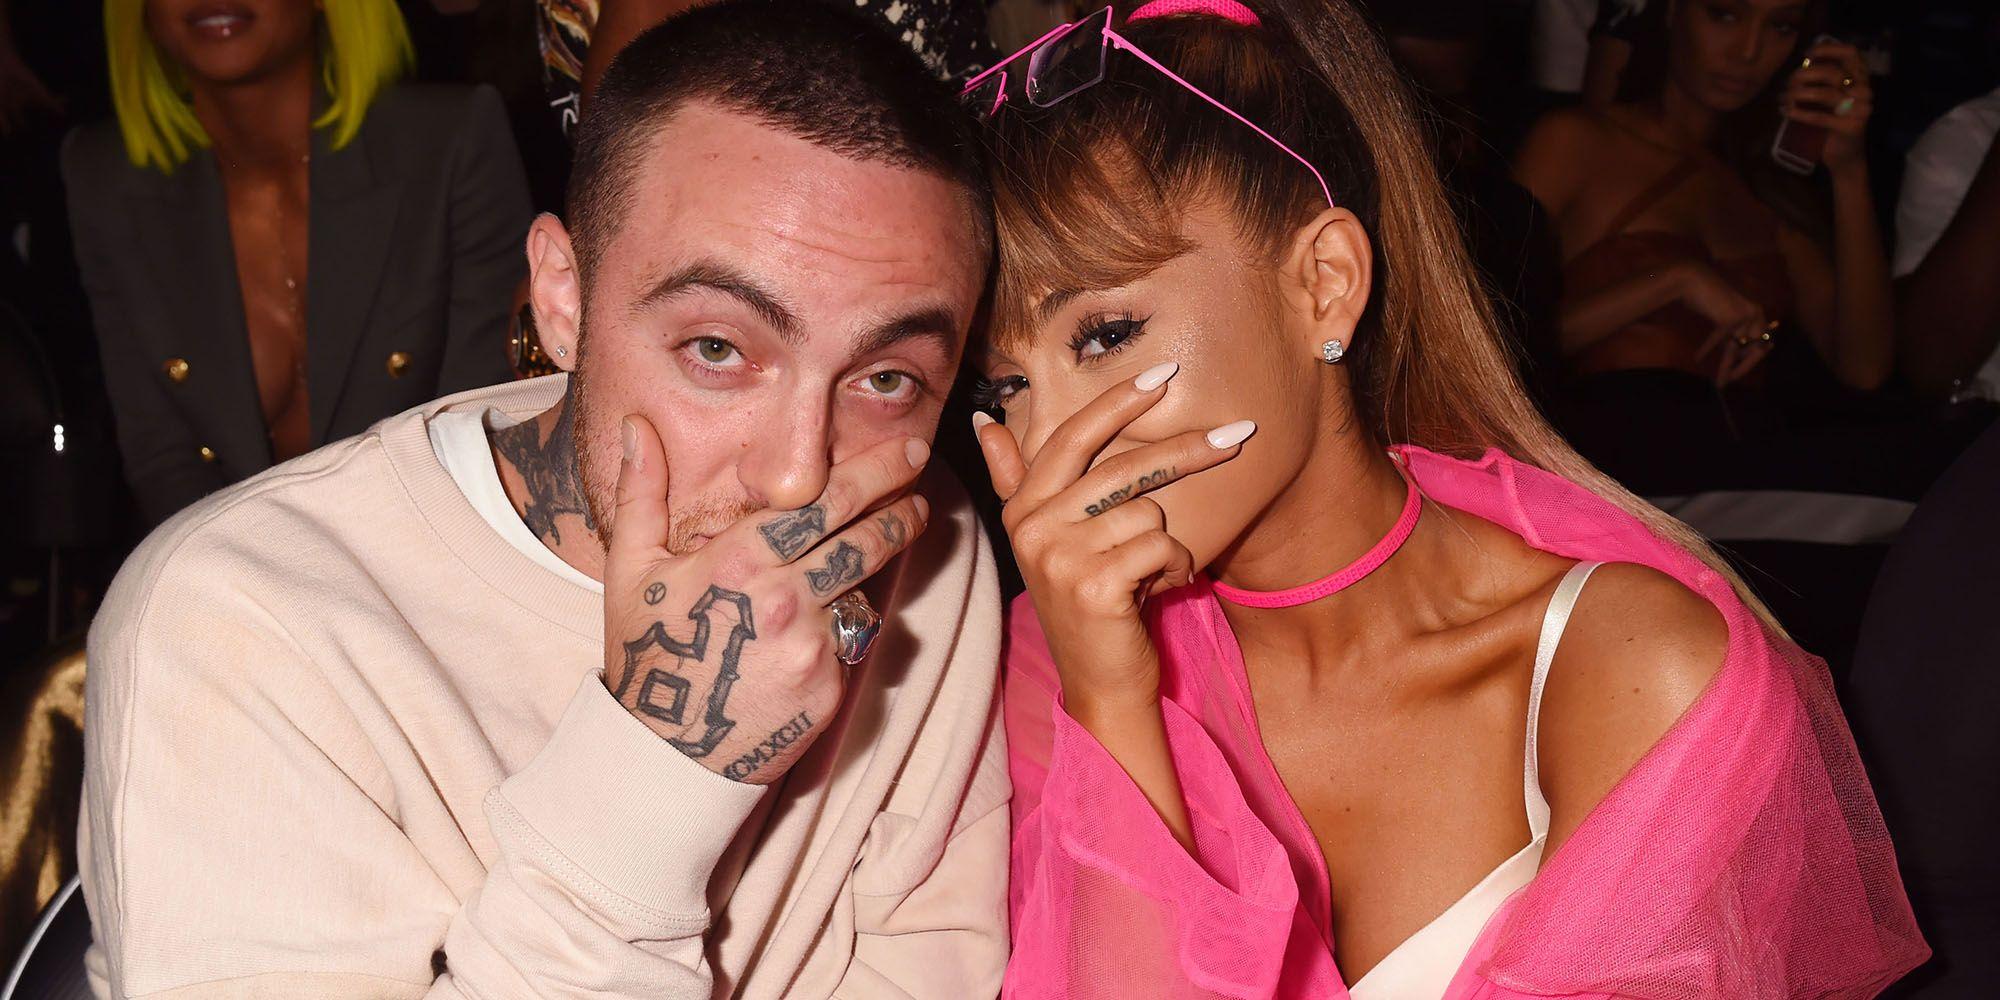 Ariana grande dating mac miller ellen